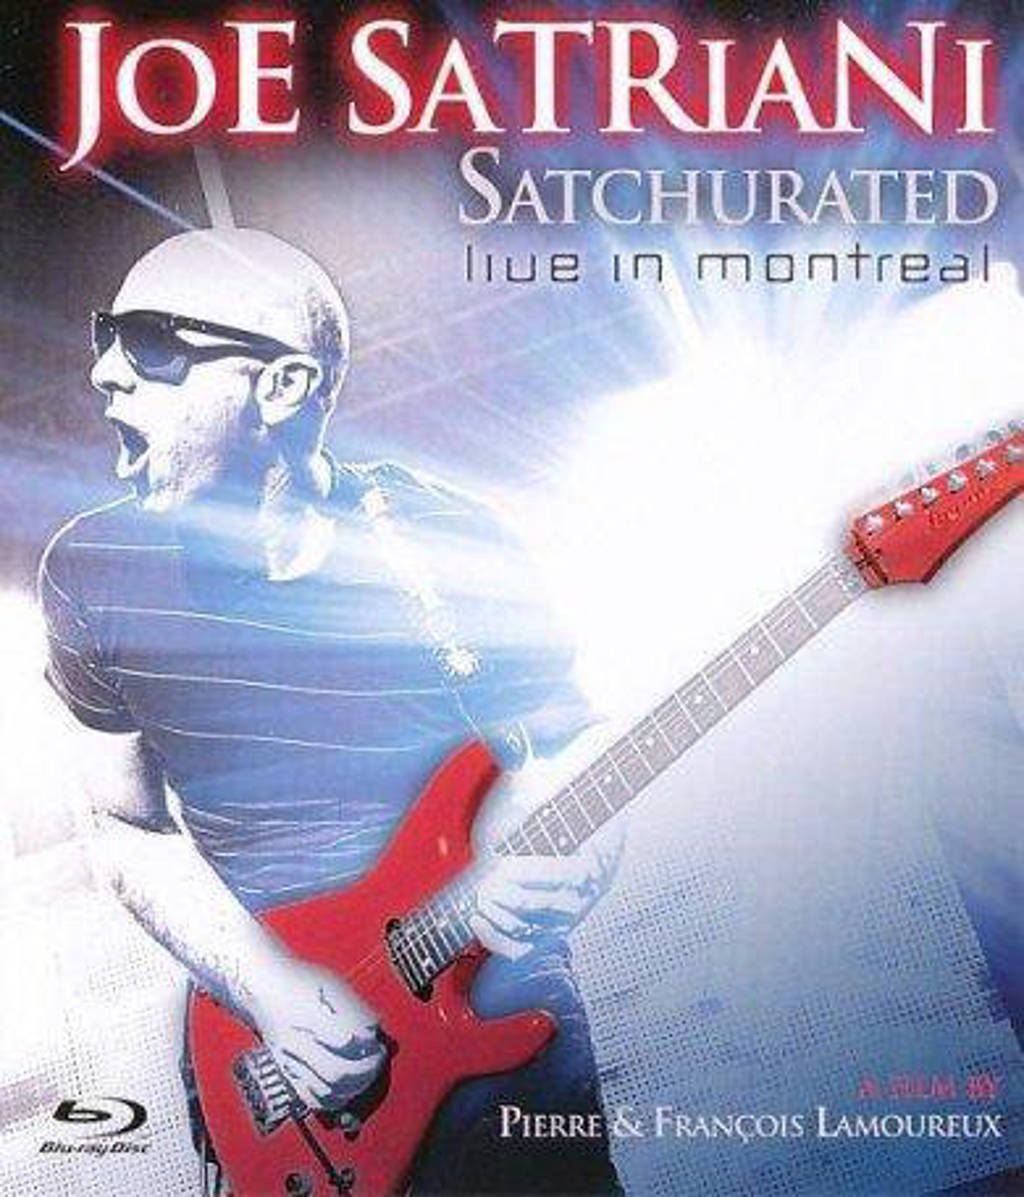 Joe Satriani - Satchurated: Live In Montreal (Blu-ray)